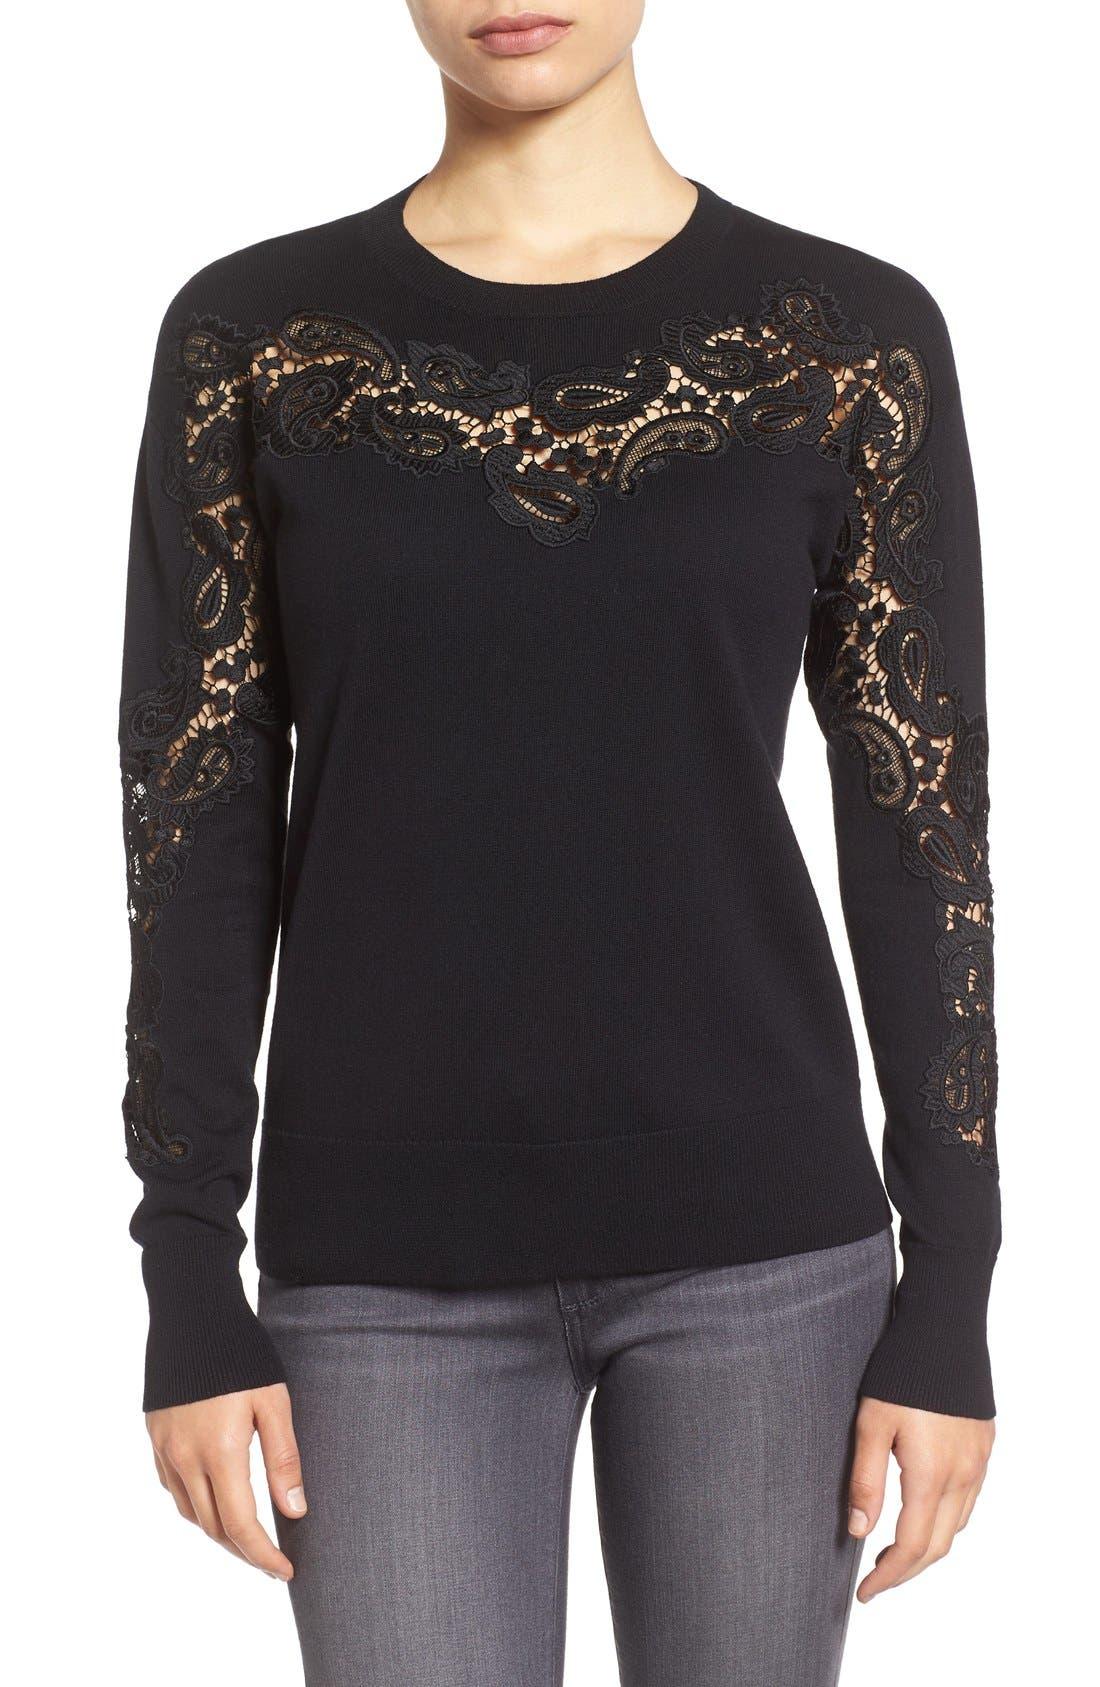 Alternate Image 1 Selected - Halogen® Lace Inset Sweater (Regular & Petite)